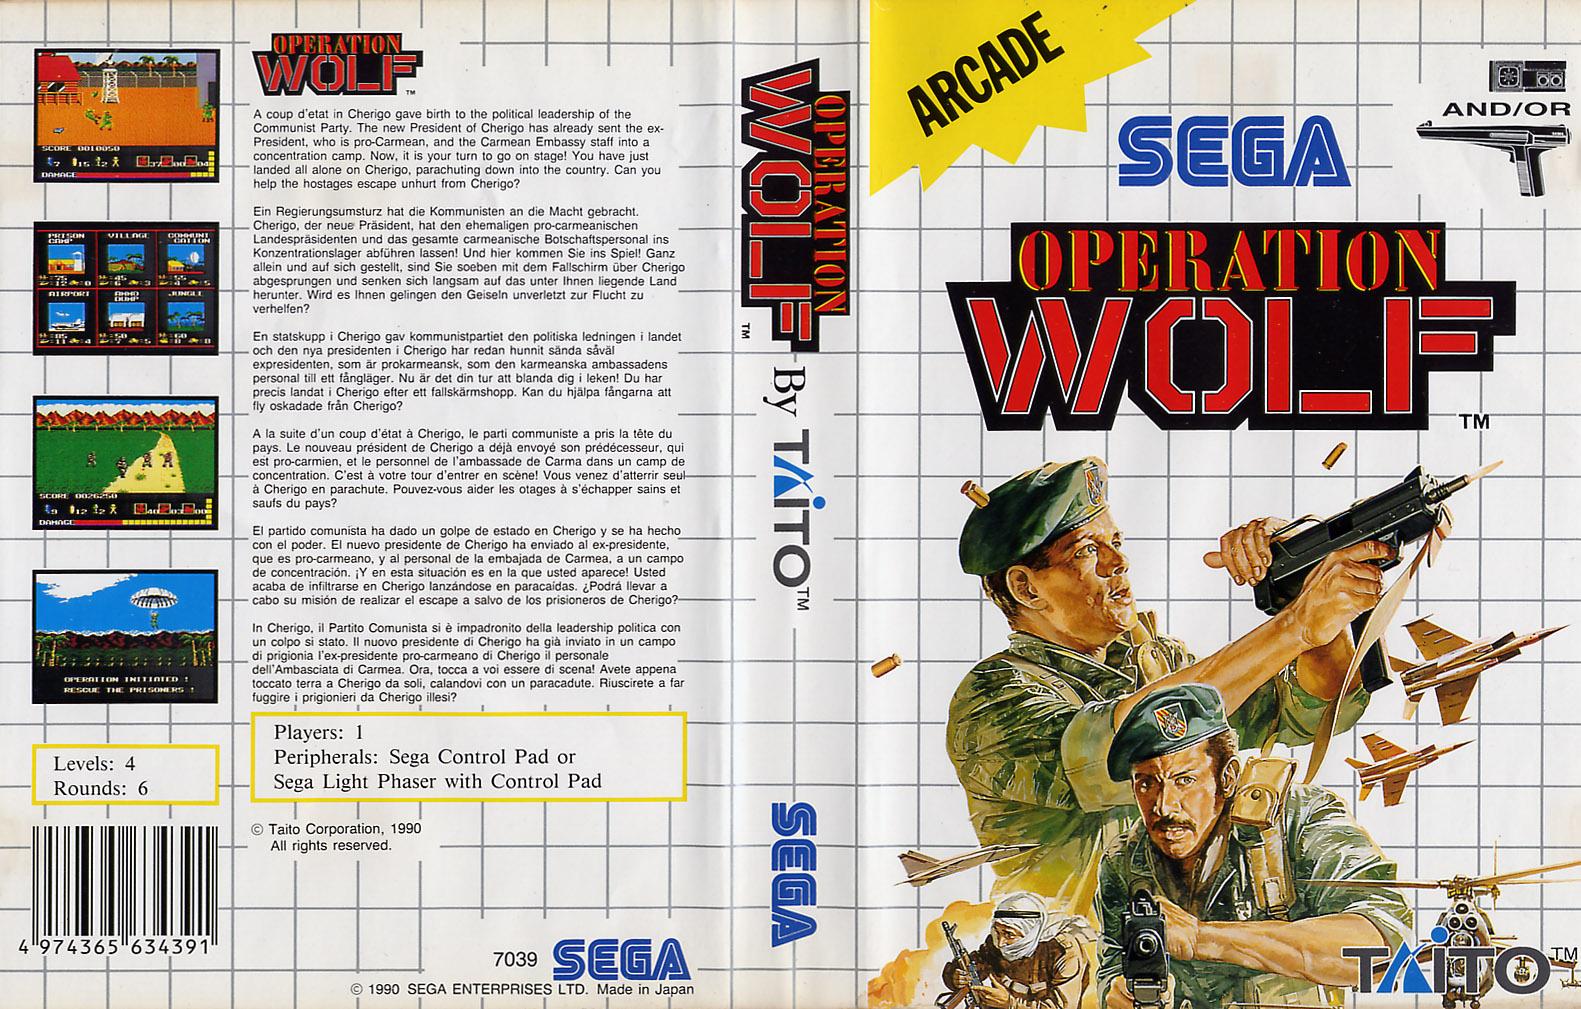 [Master System] Les Jeux Light Phaser OperationWolf-SMS-EU-NoR-6Langs